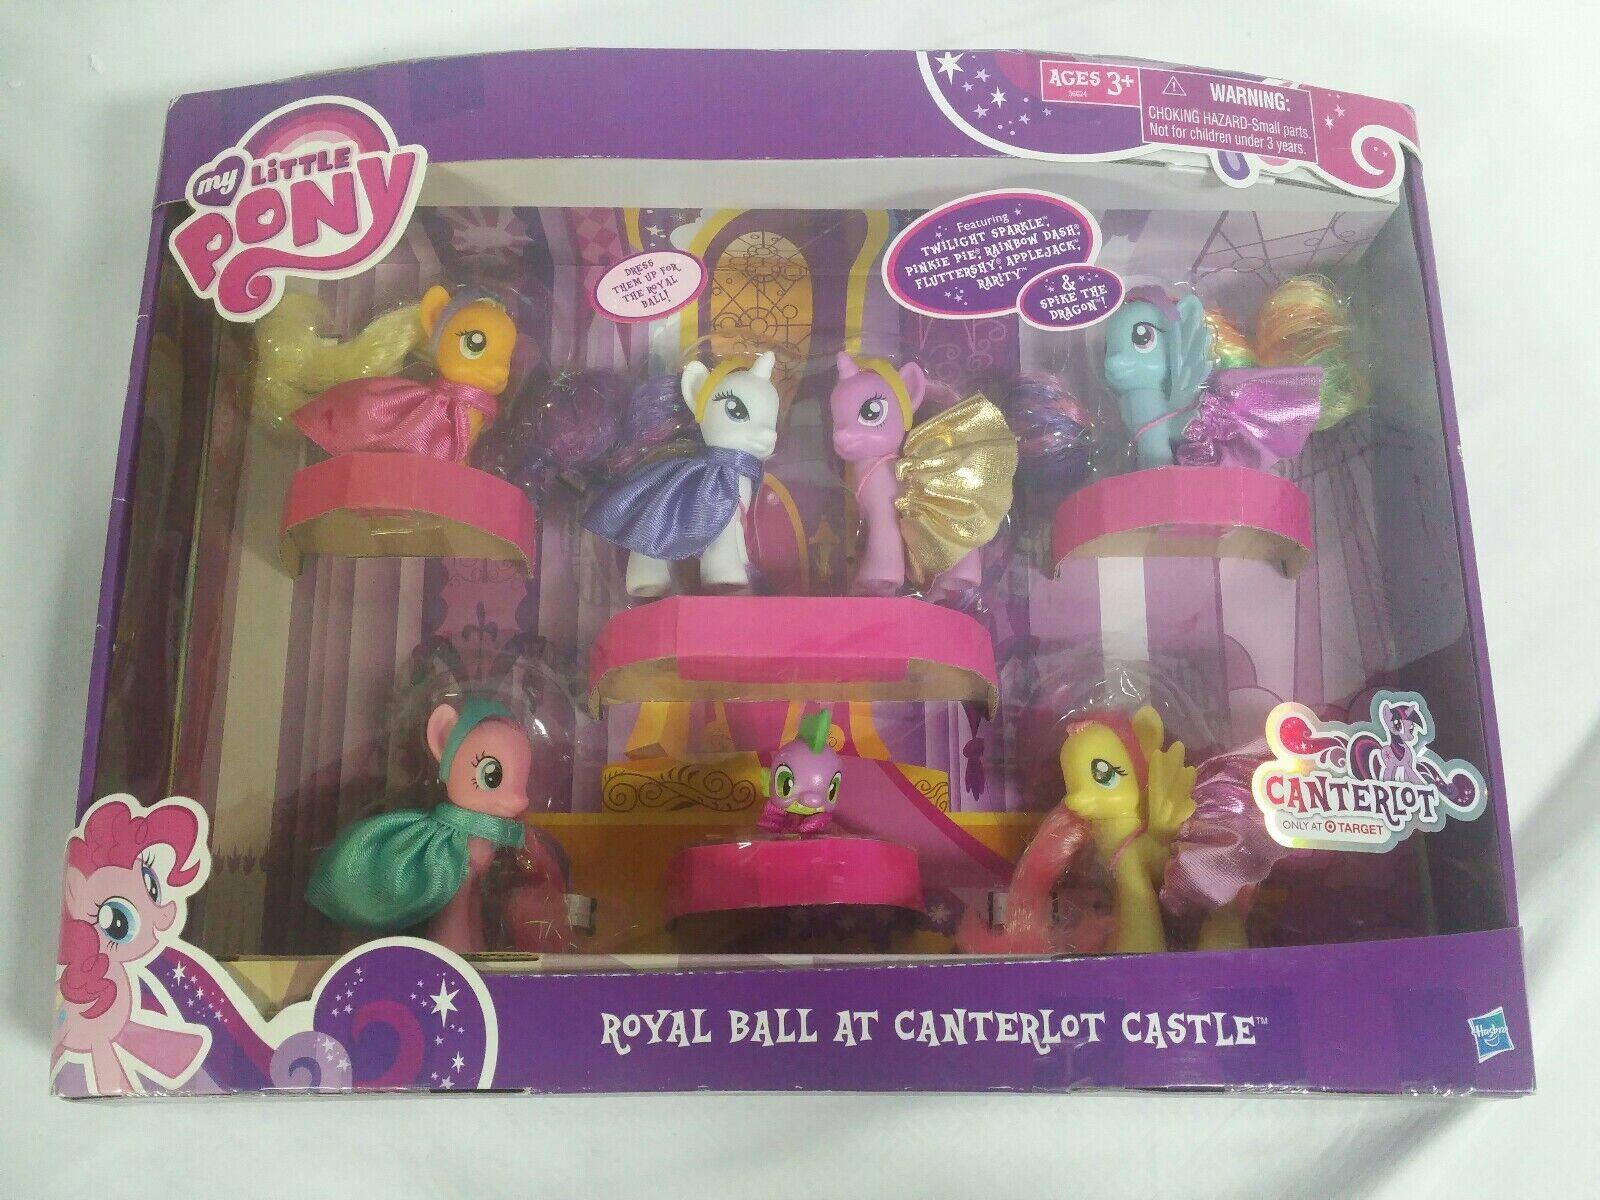 Min lilla Pony Canterlot Royal boll vid Canterlot Castle